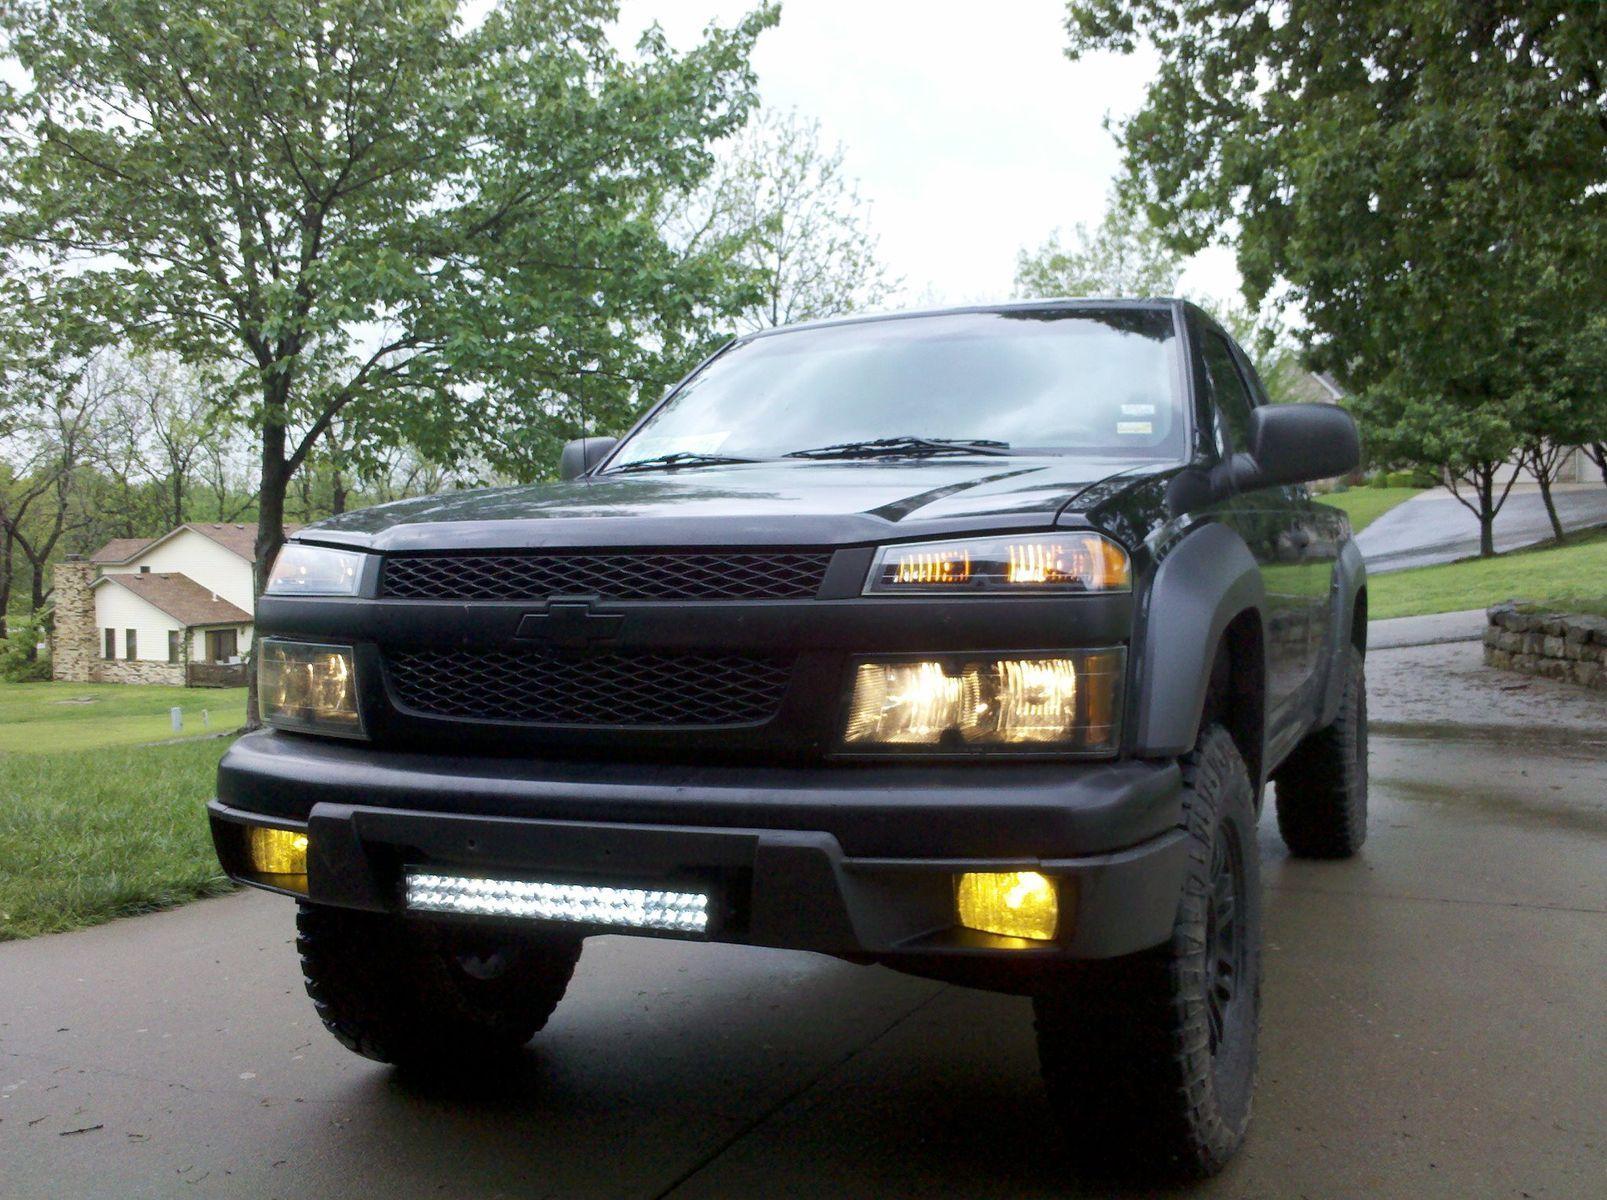 Chevrolet Colorado | Blacked Out Chevrolet Colorado